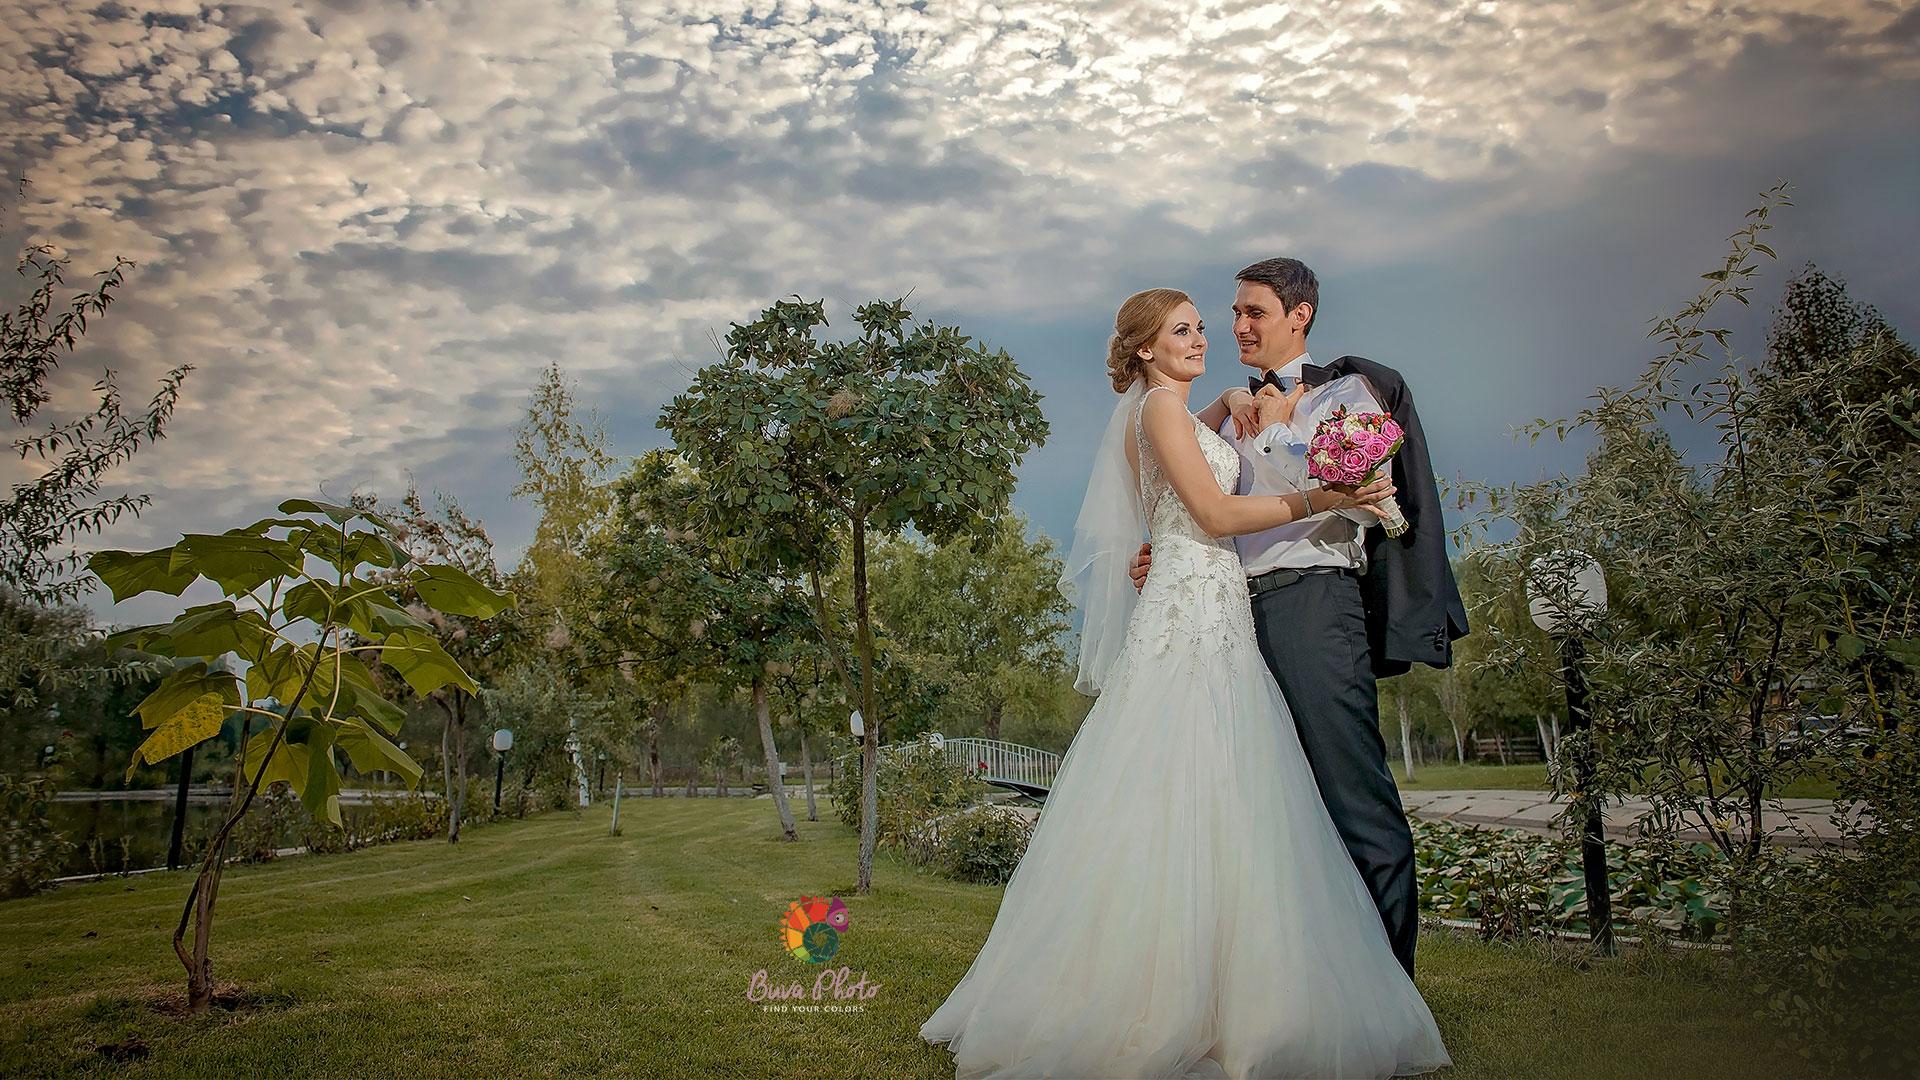 fotografie-nunta-cover-1